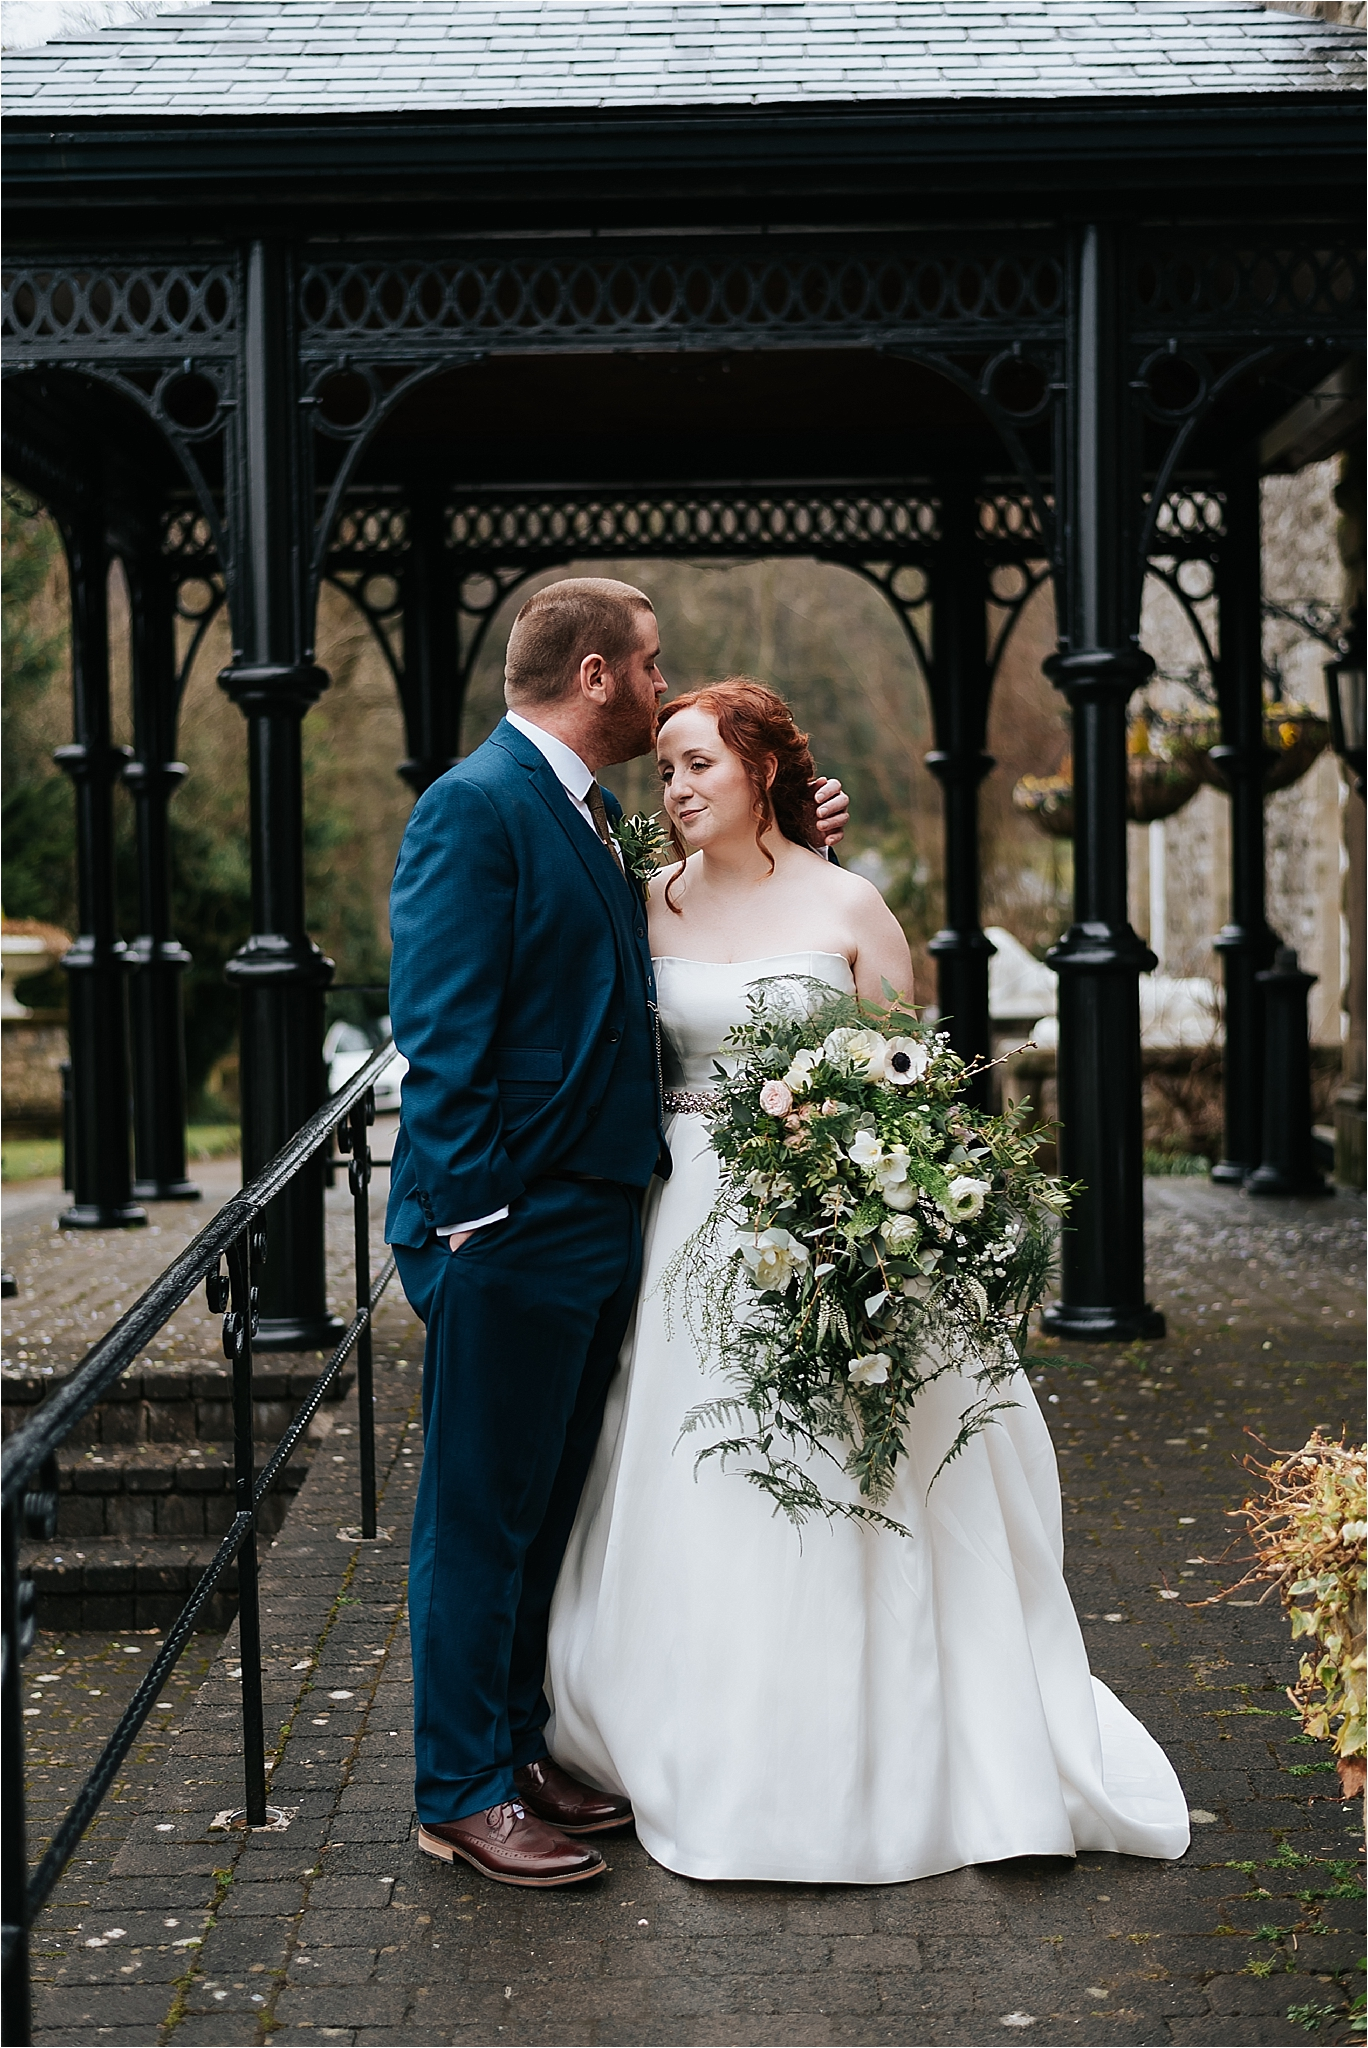 wedding portrait of bride and groom together